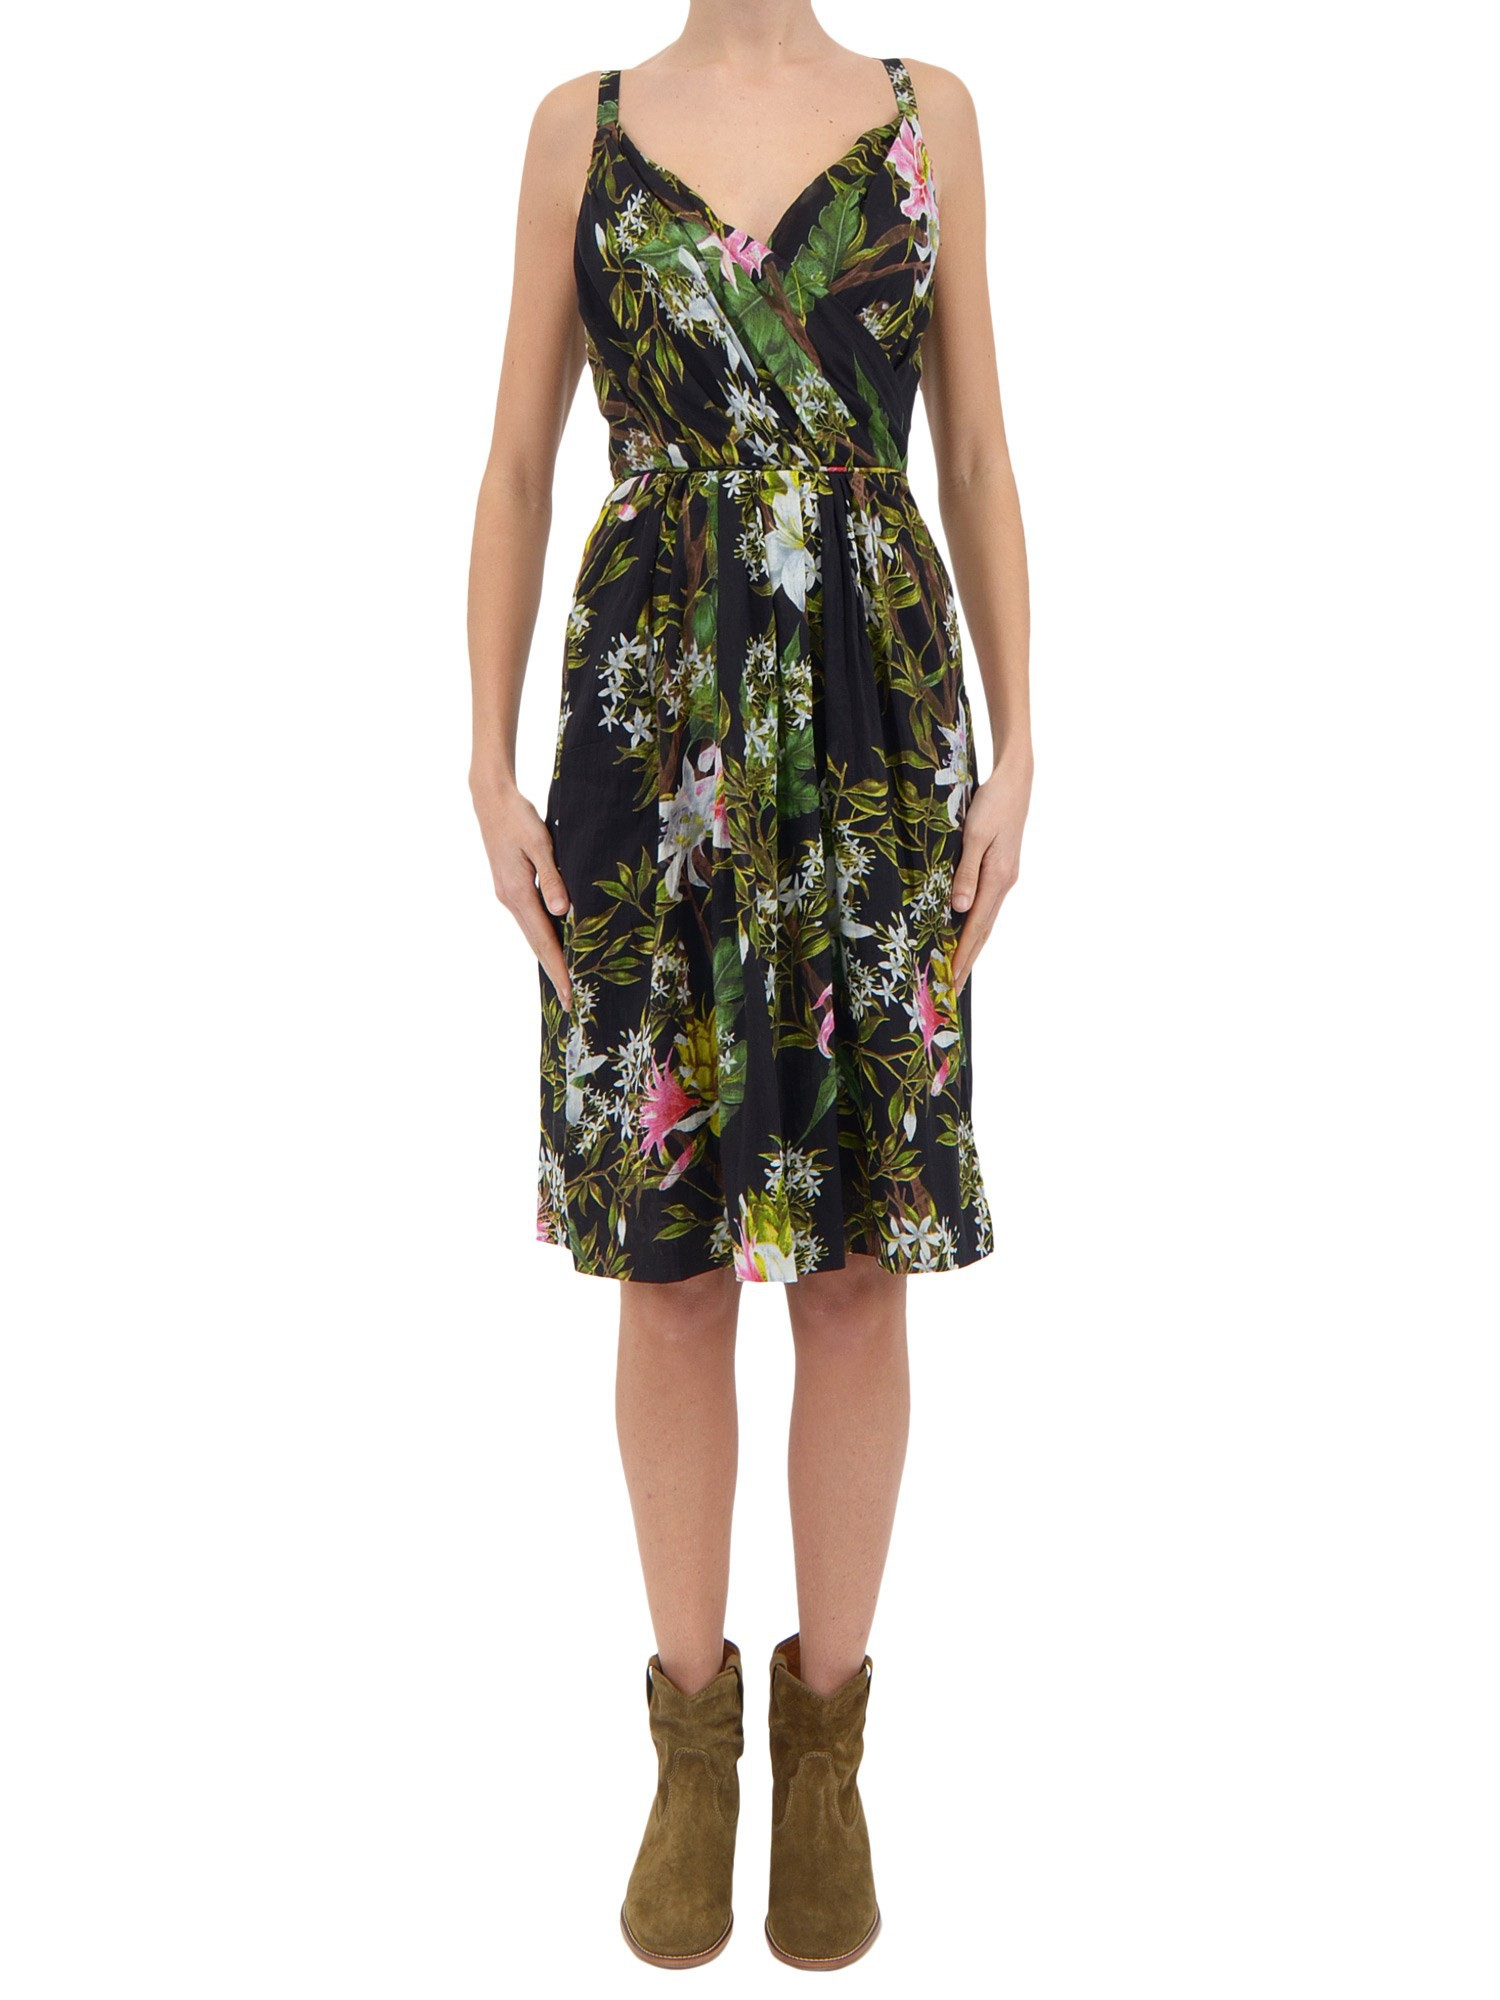 Etoile Isabel Marant Welby Dress in Green (Nero)